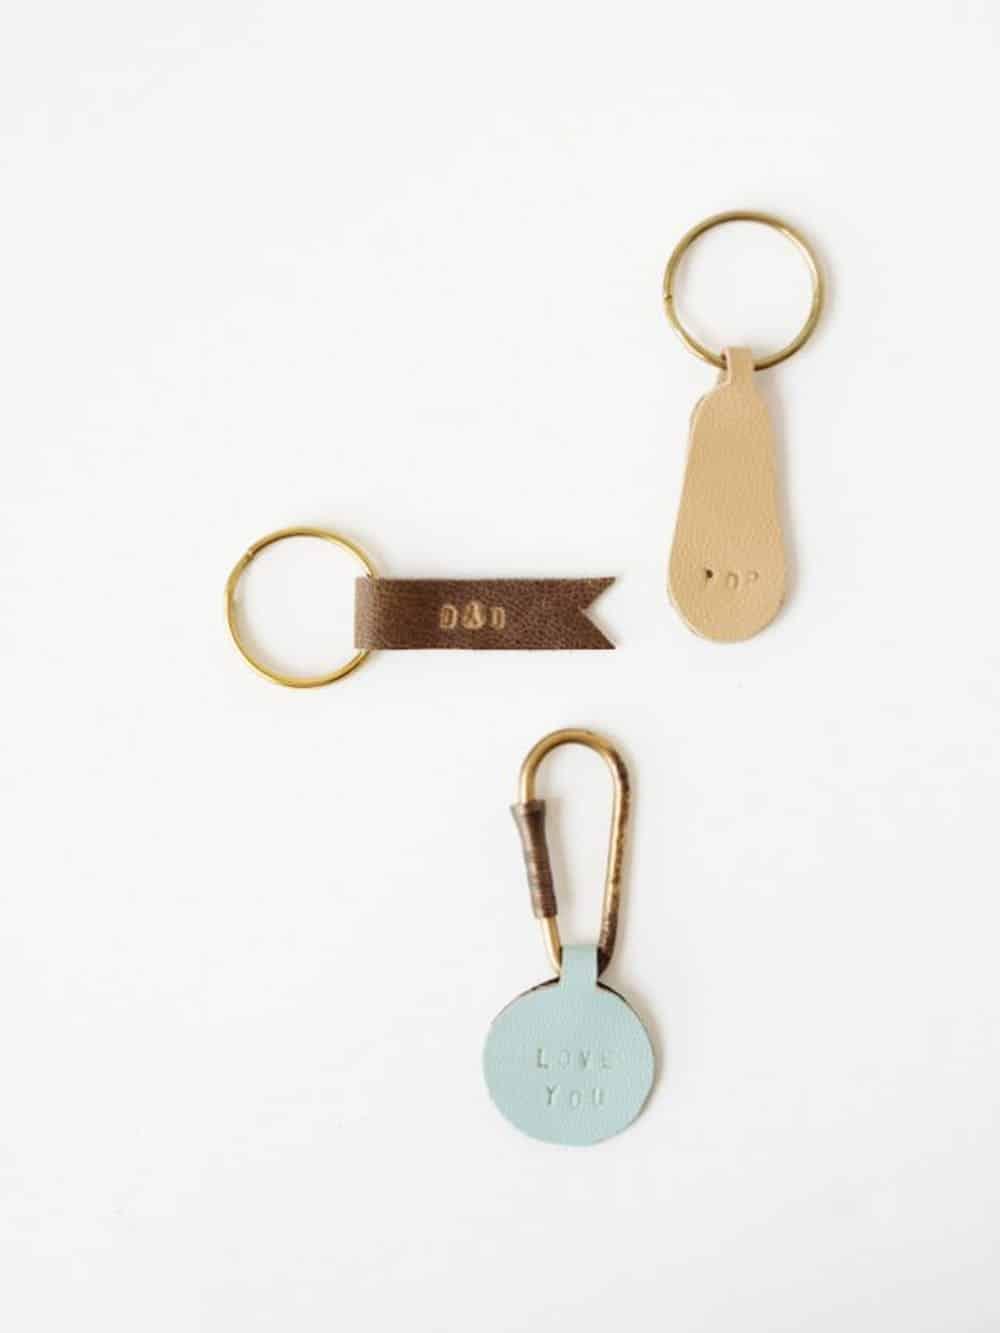 Diy personalized keychains